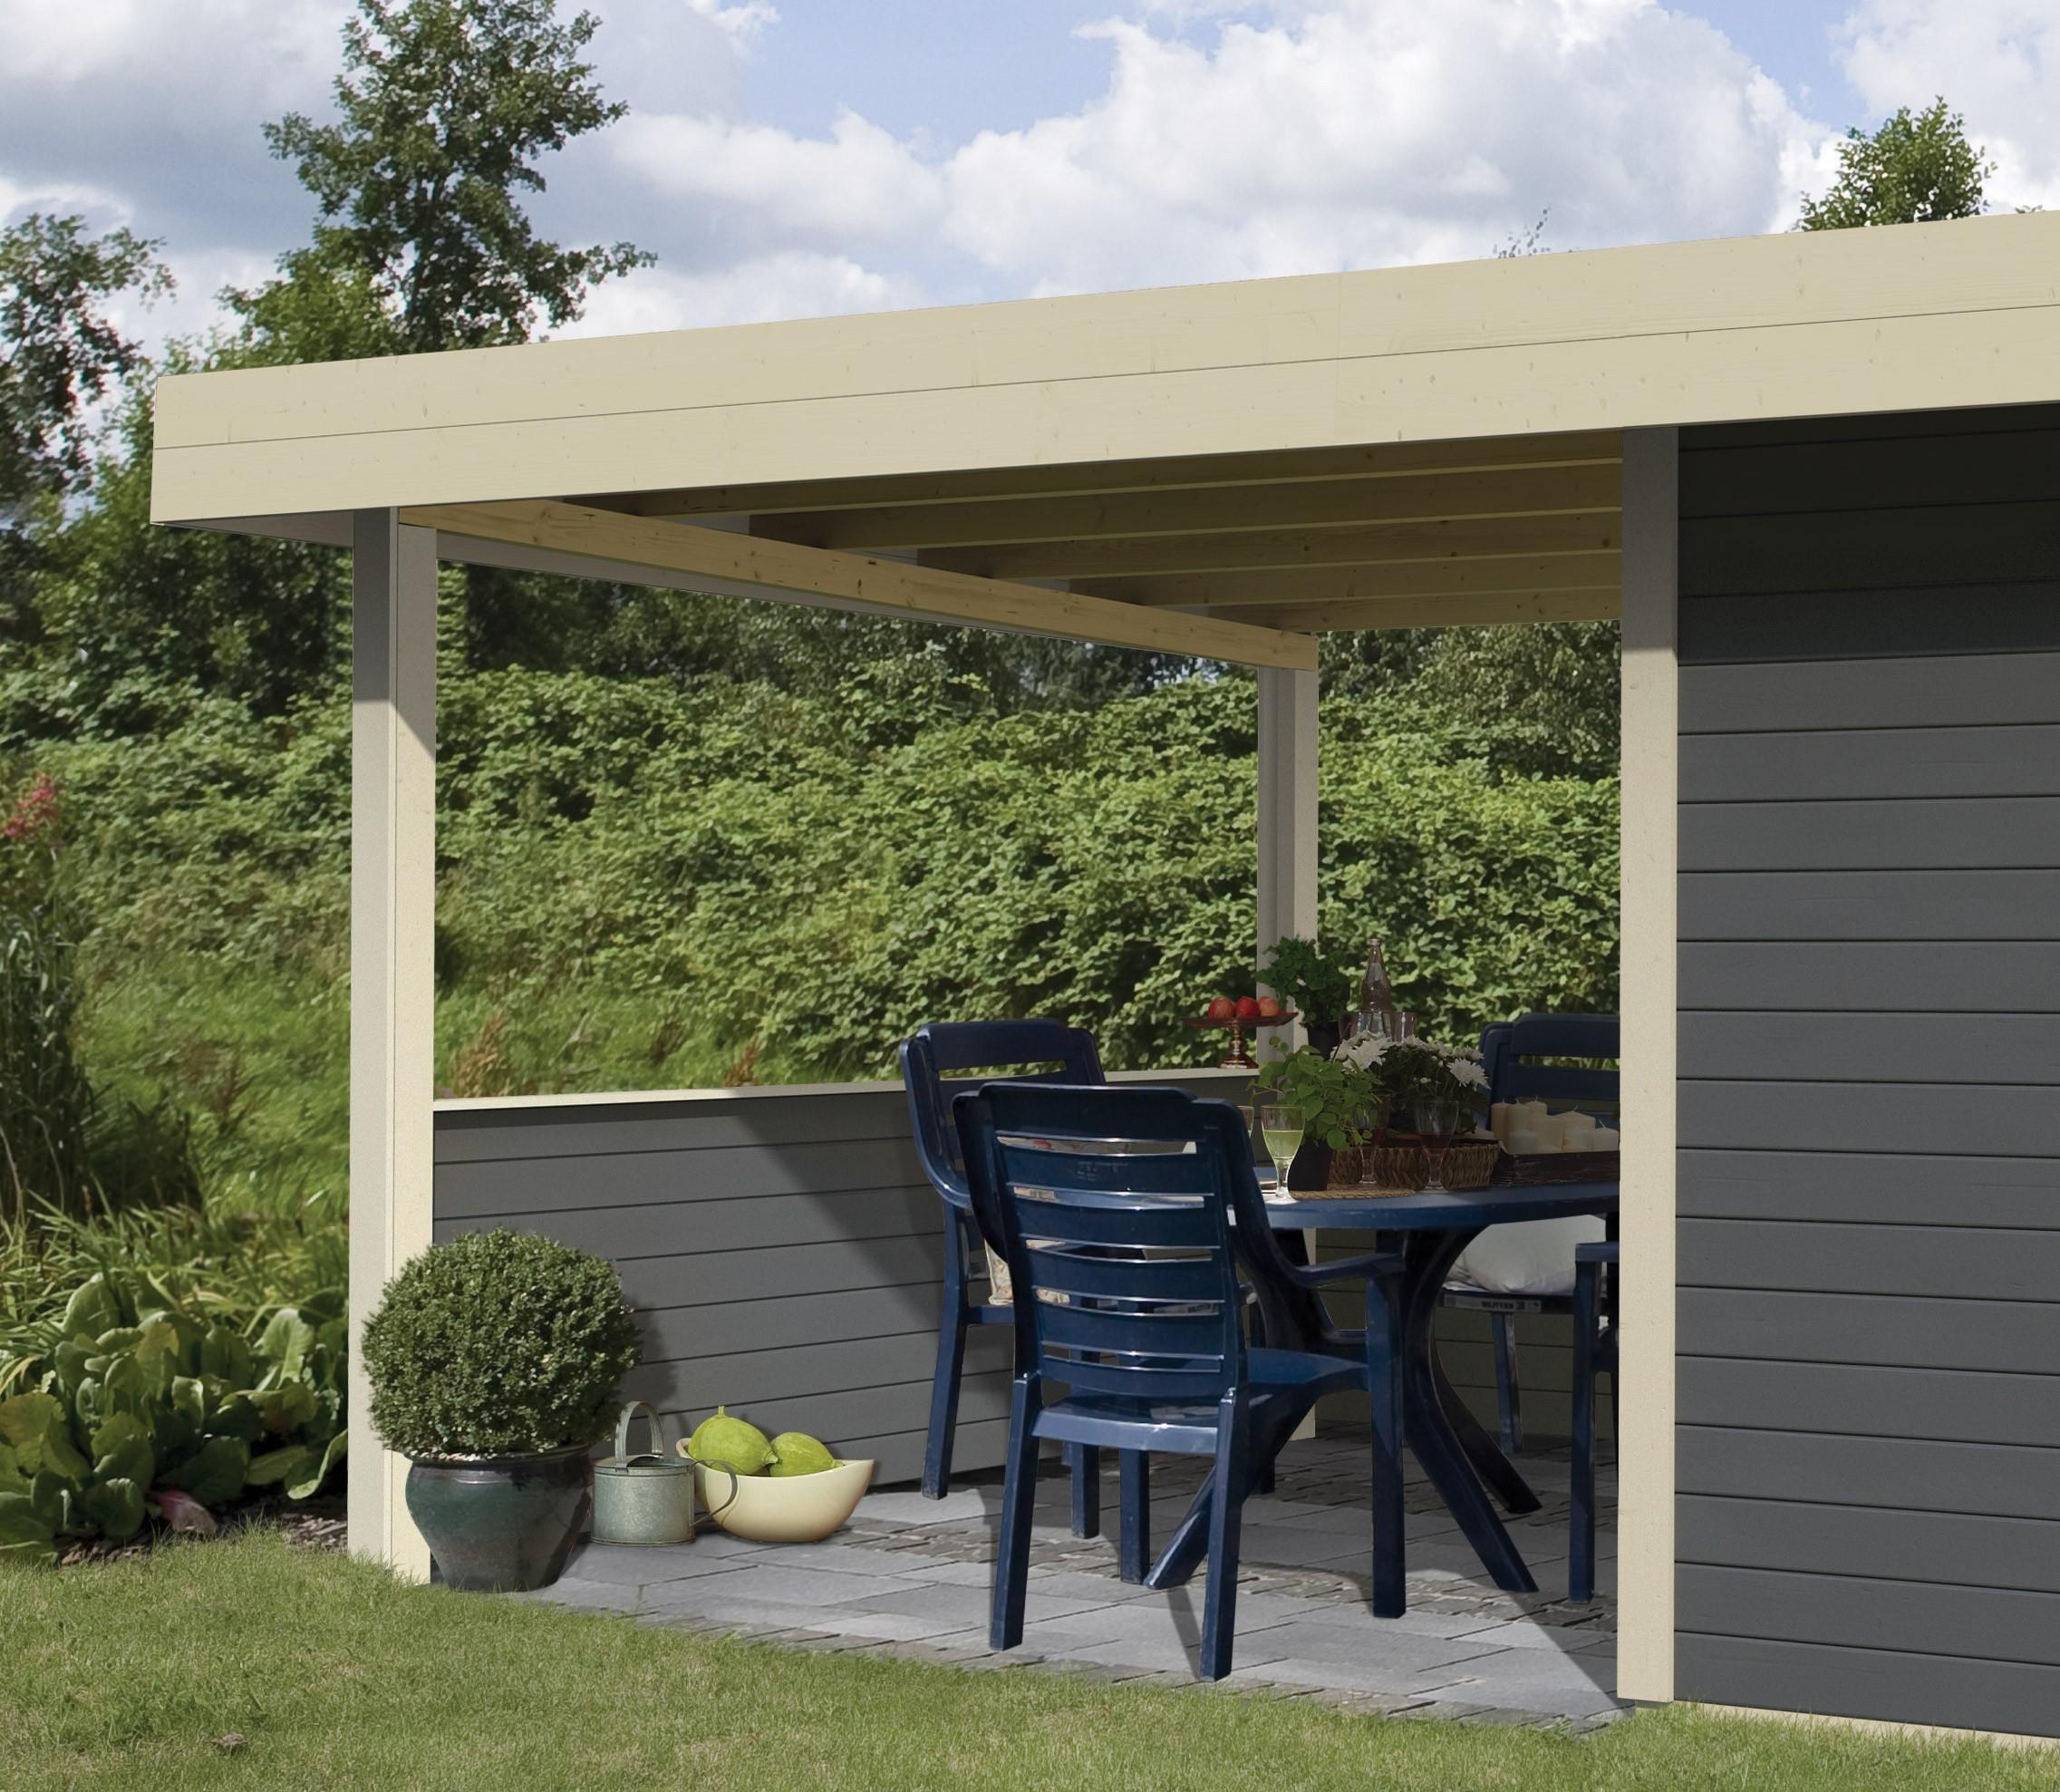 gartenhaus multi cube 2 my blog. Black Bedroom Furniture Sets. Home Design Ideas